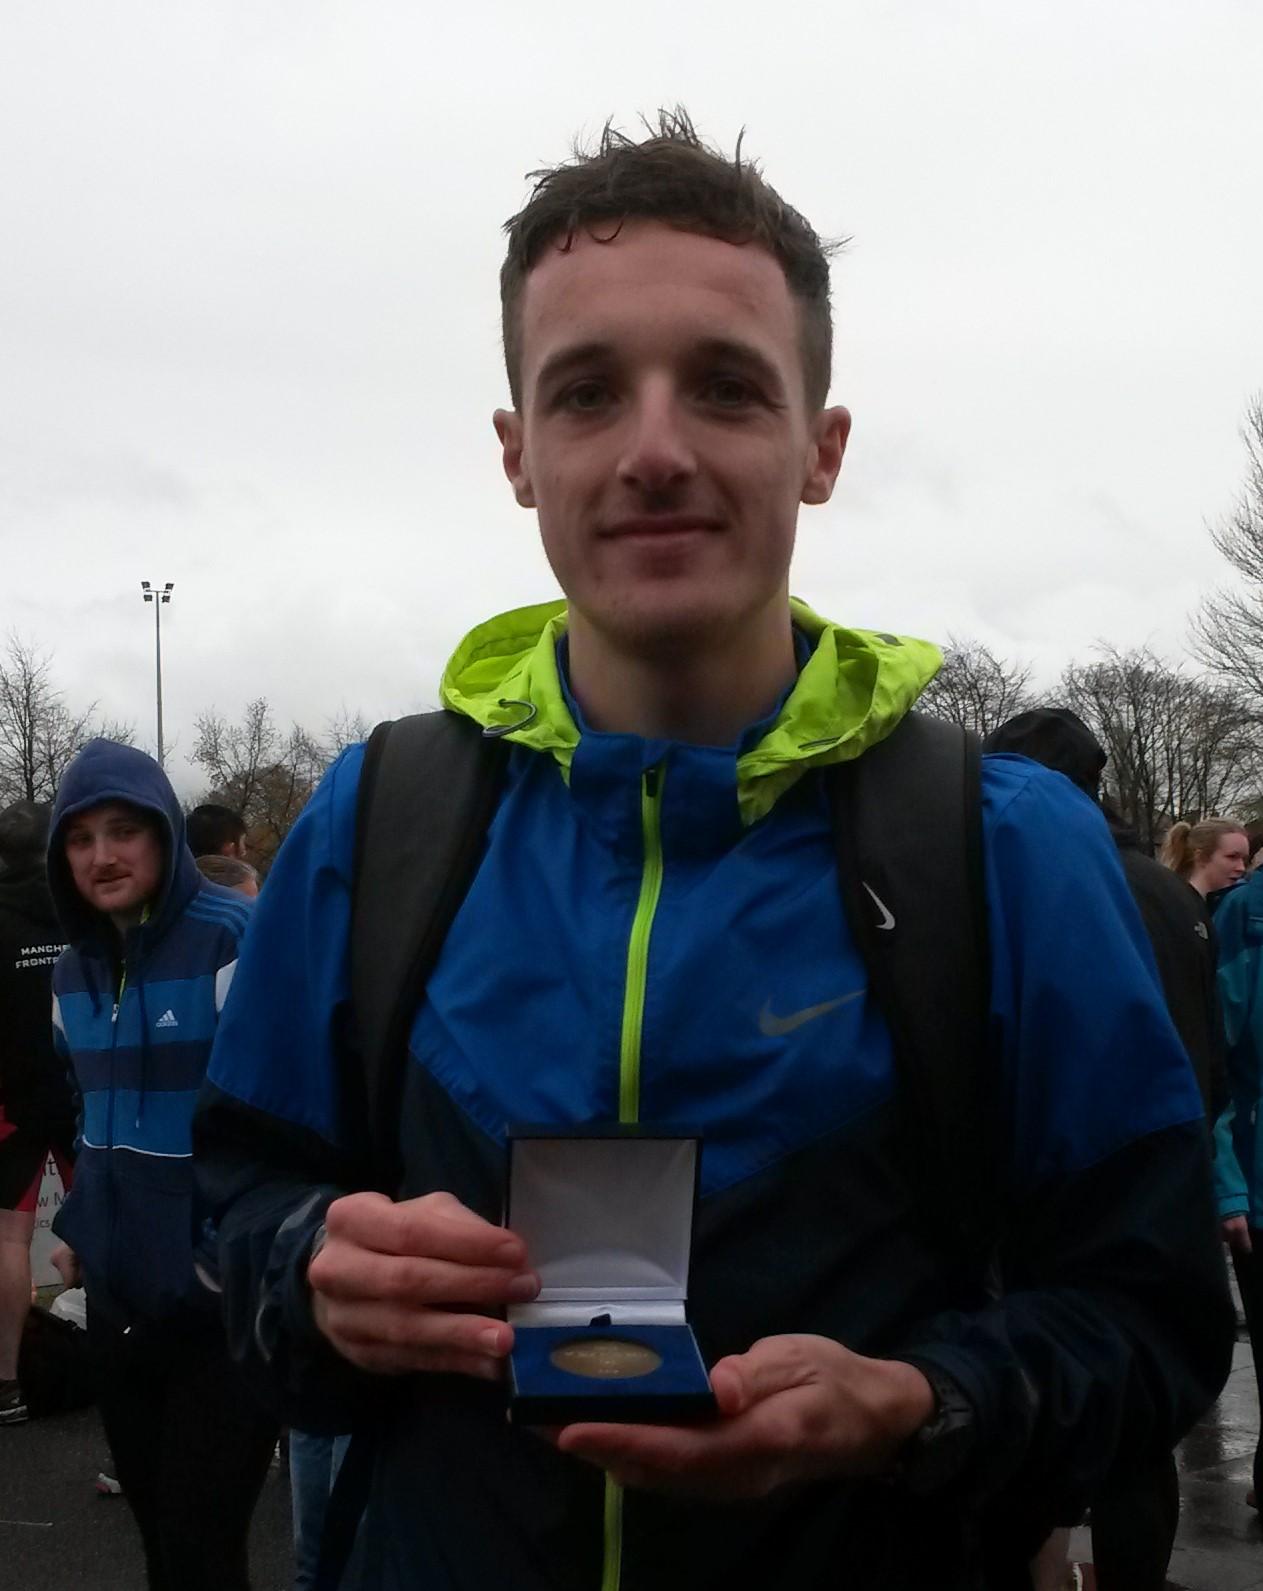 Northern Athletics 10 Mile Championship